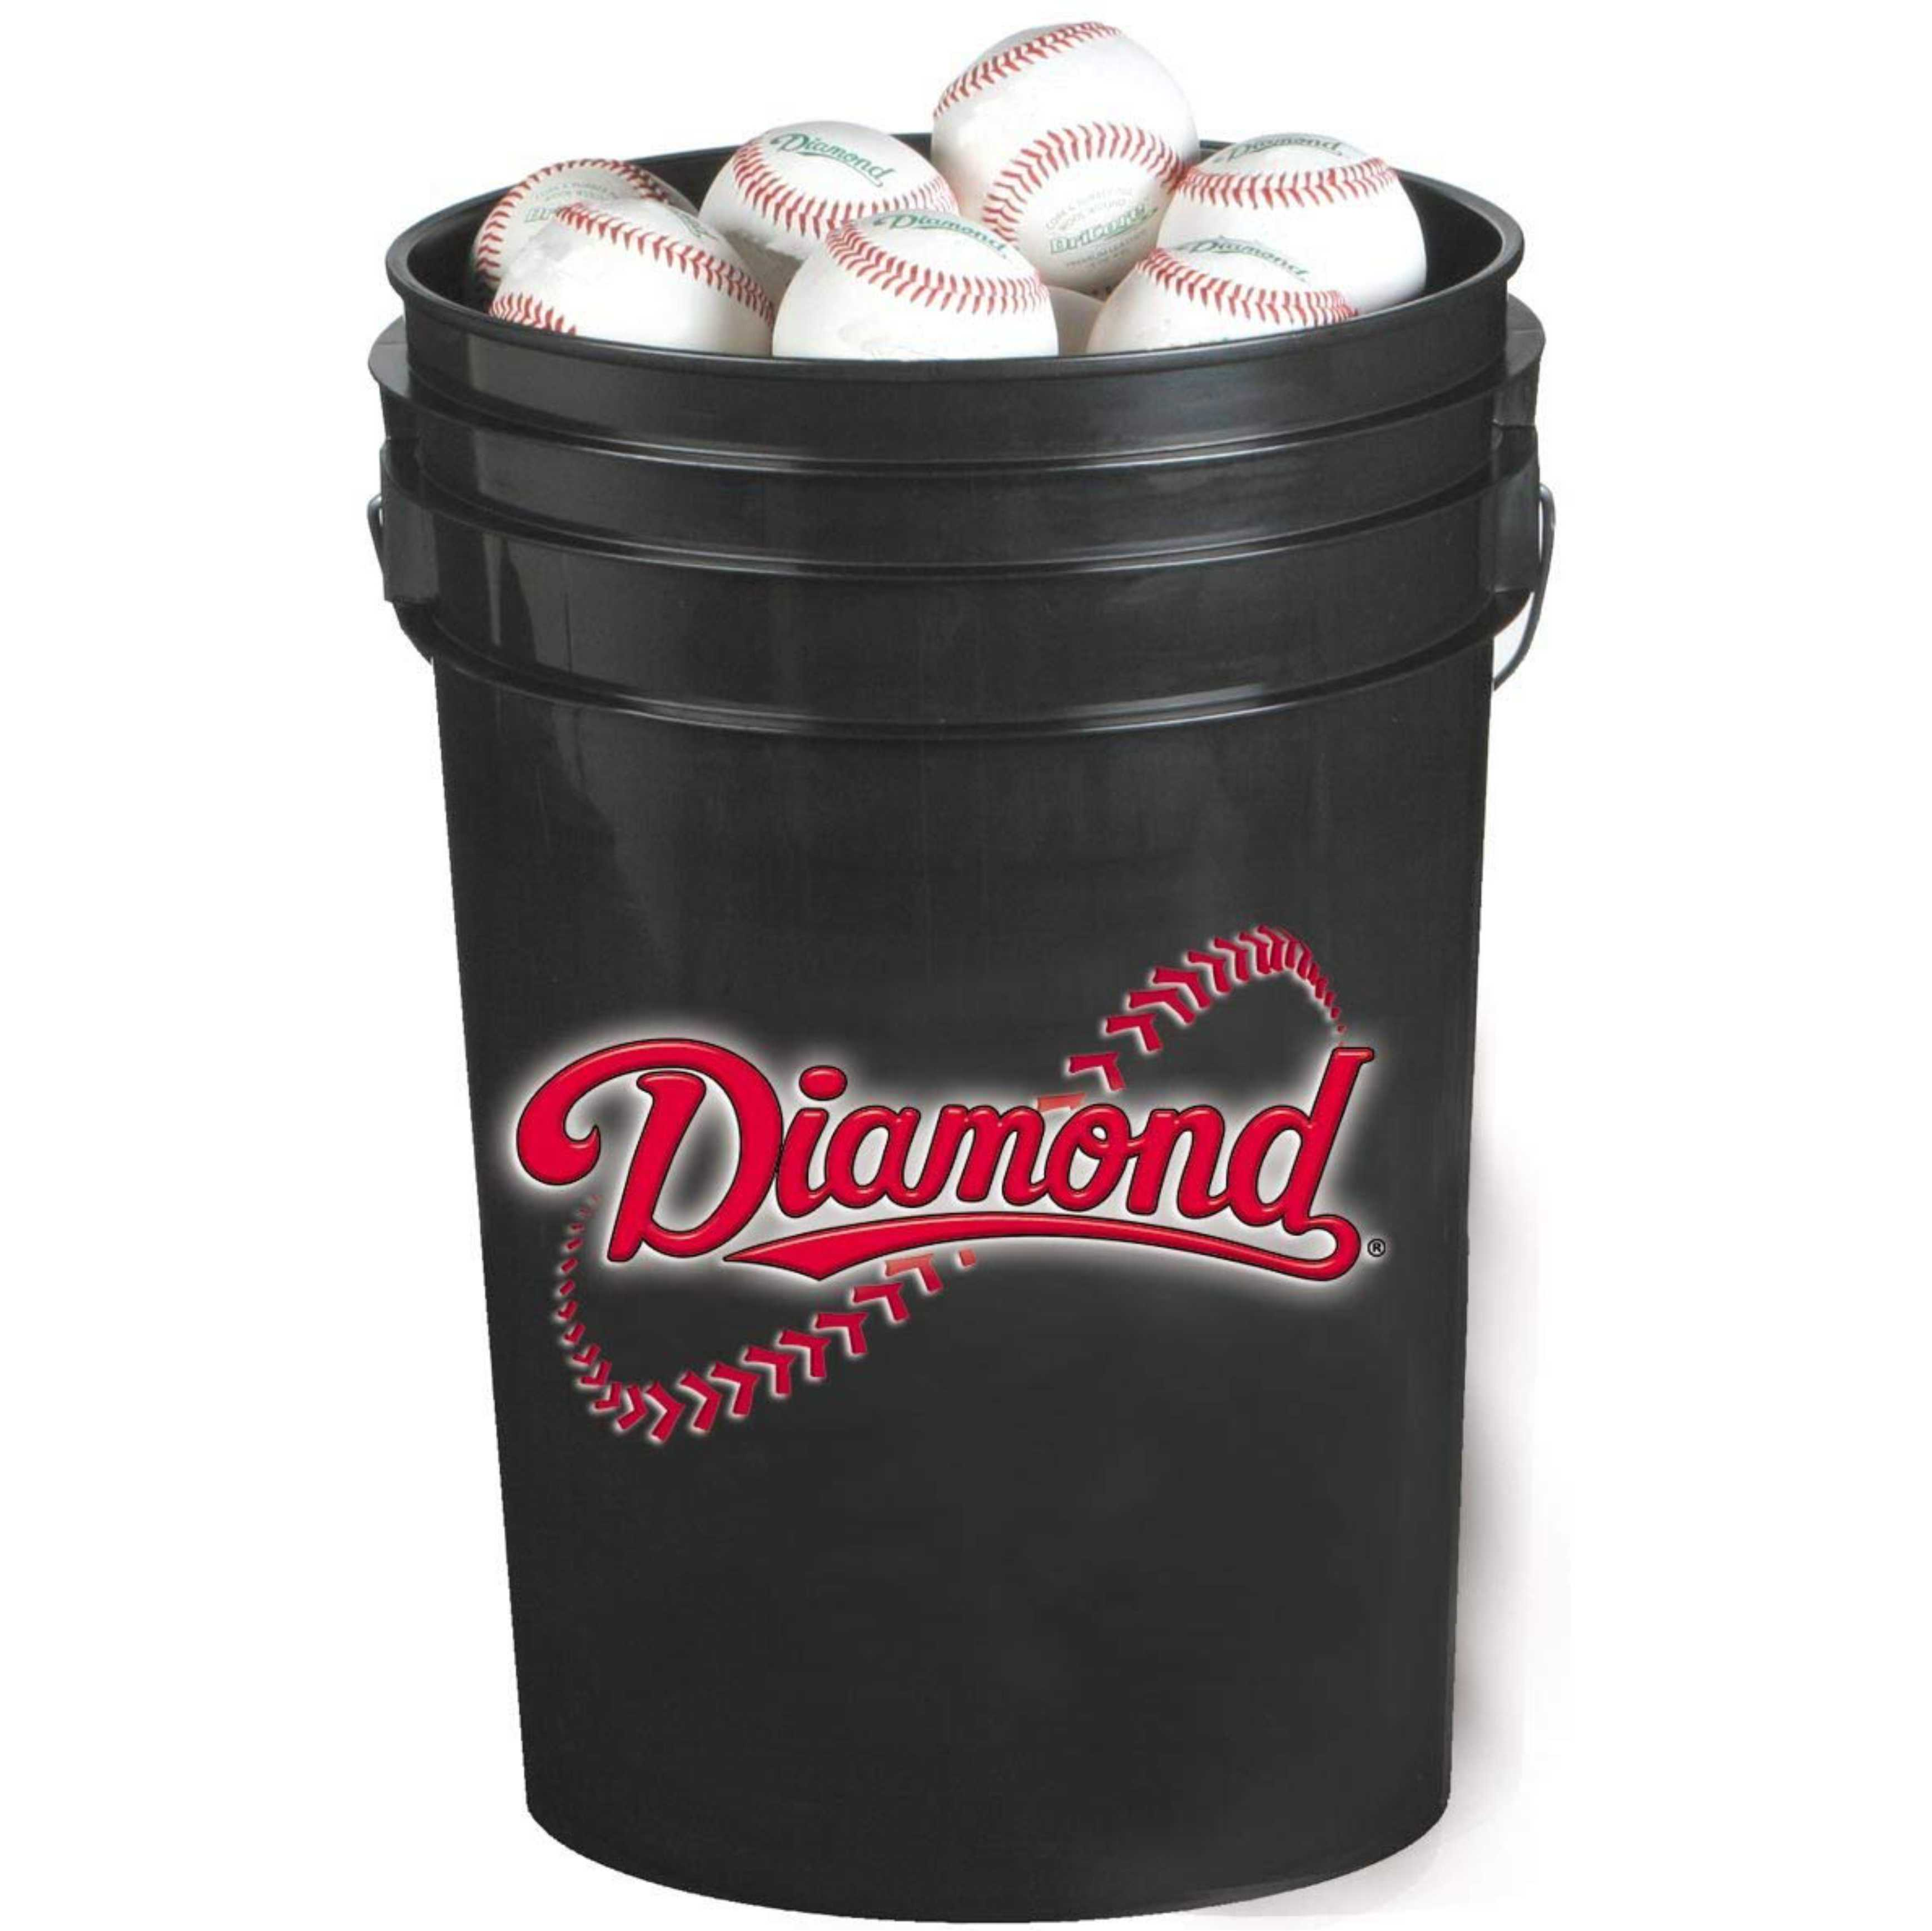 Diamond BKT B DBX 30 Bucket Combo (includes 30 DBX Practice Baseballs)